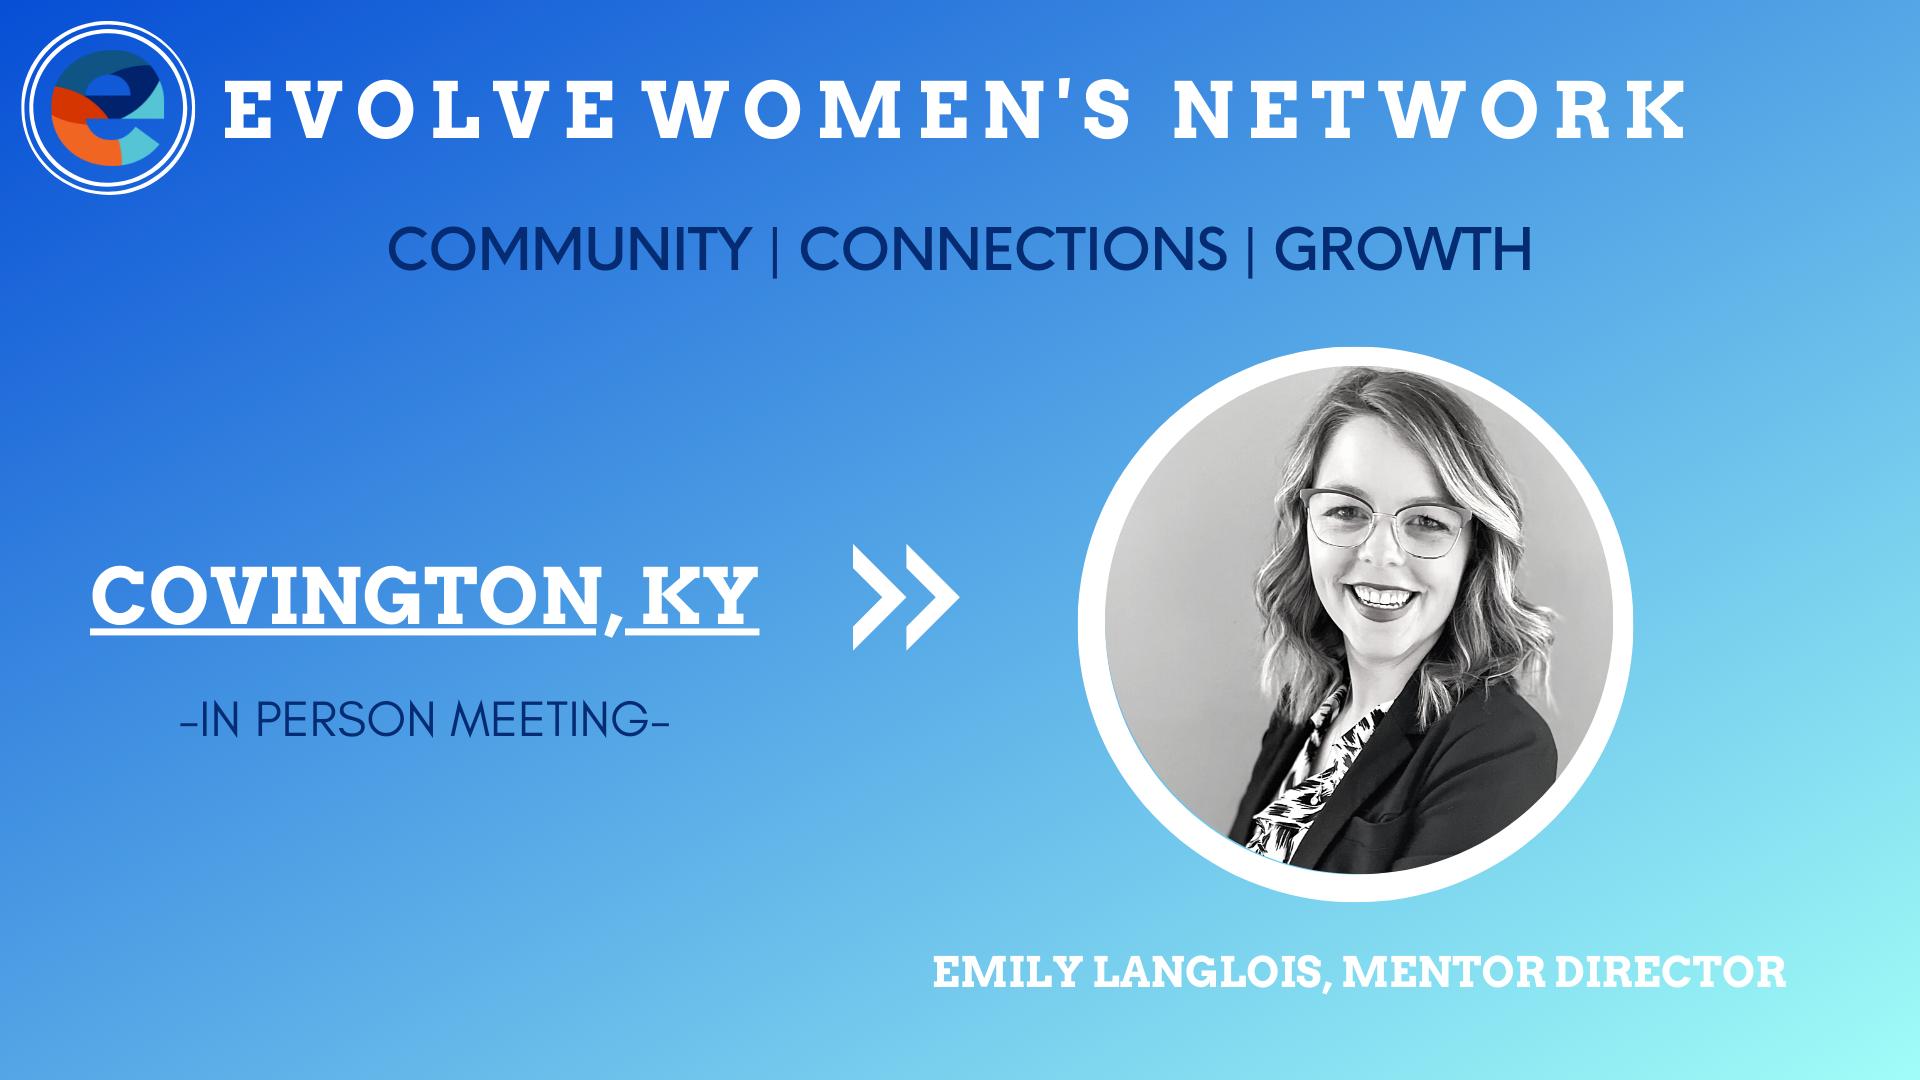 Evolve Women's Network: Covington, KY (In-Person)